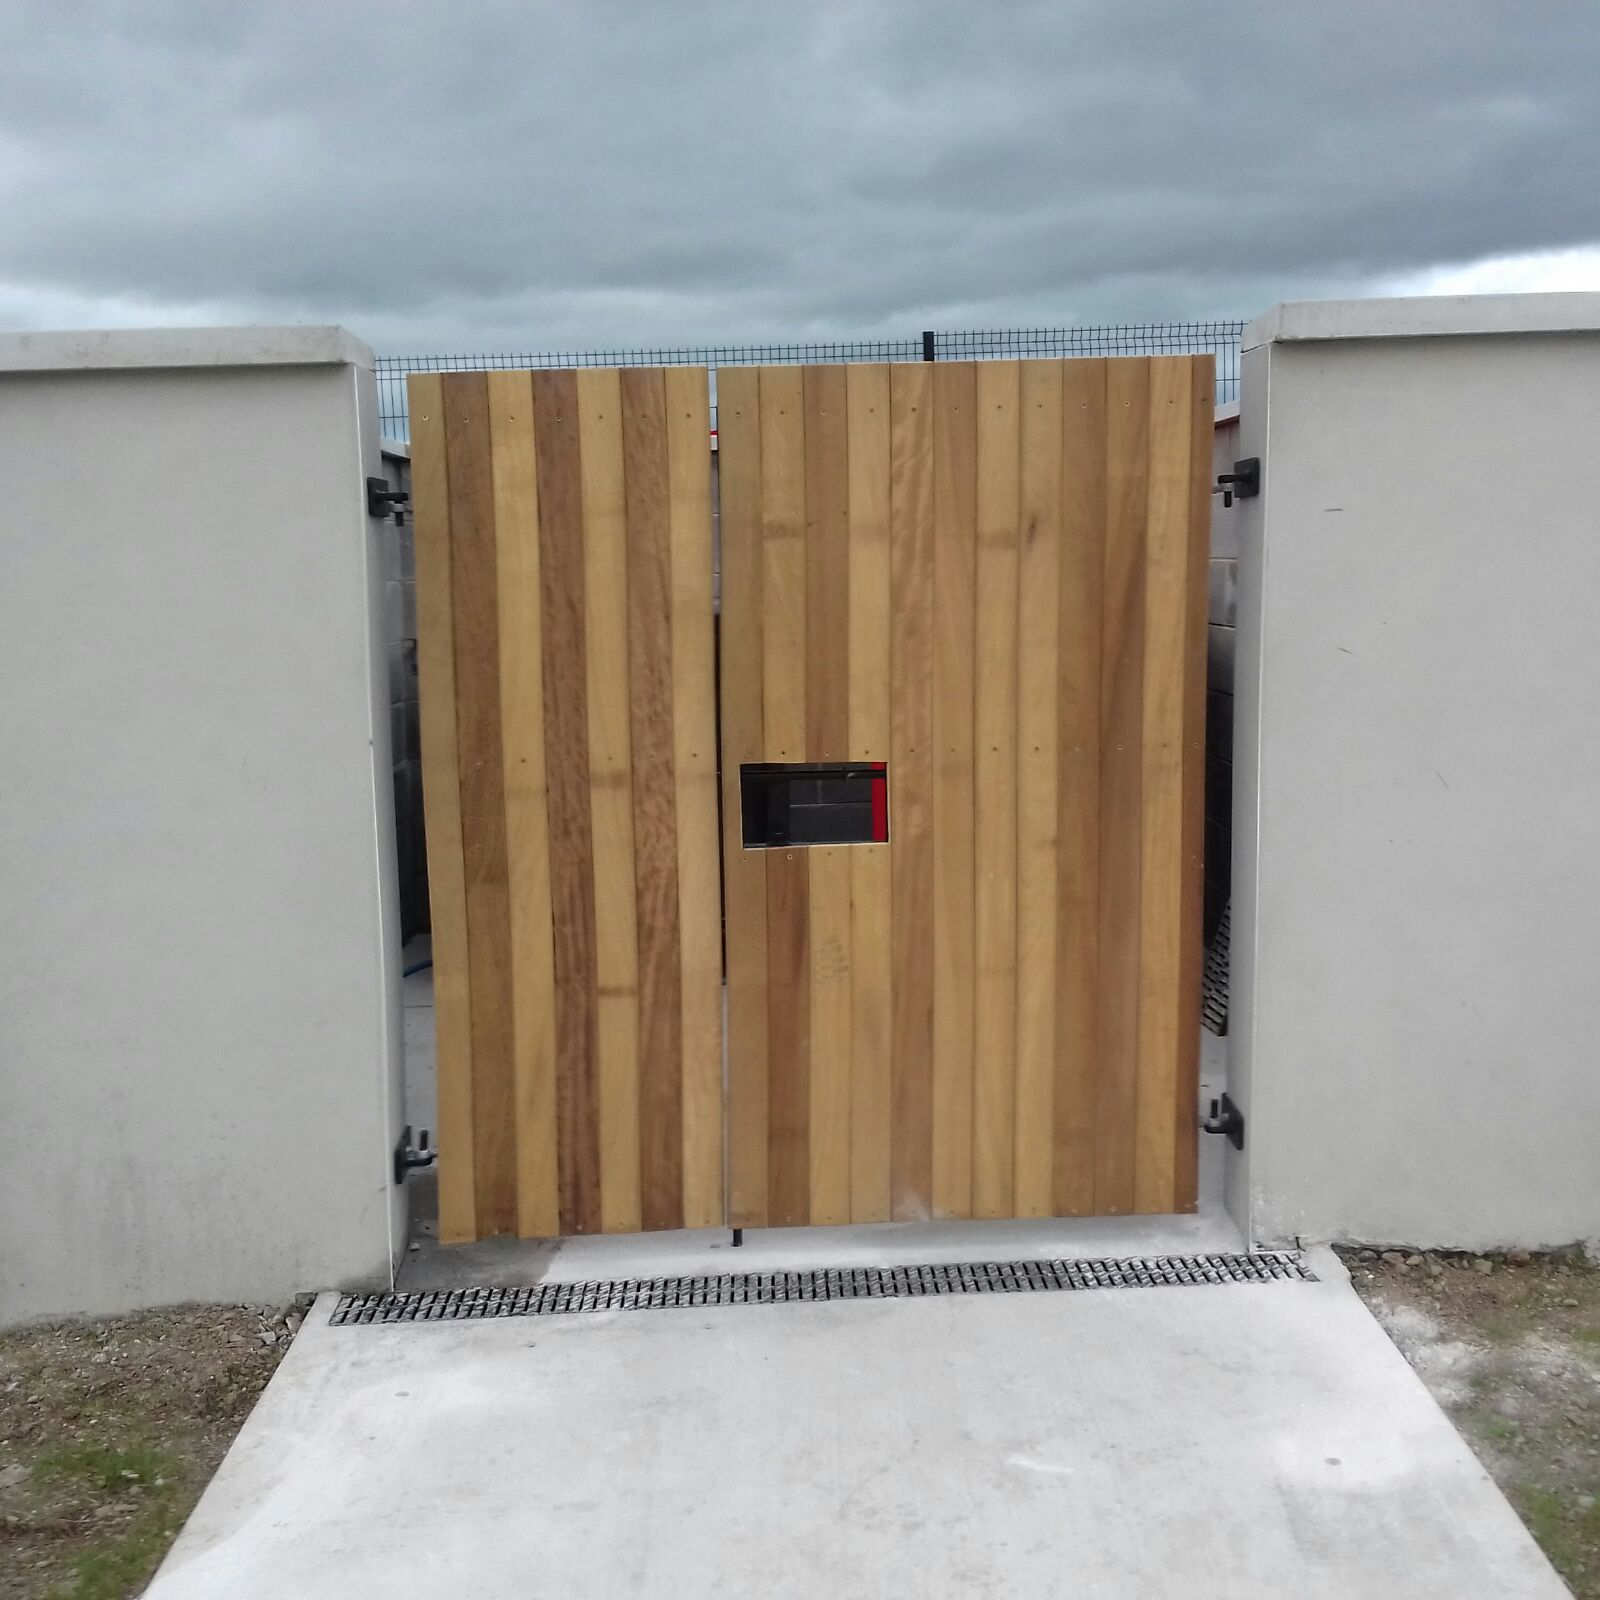 Bin Store Gate